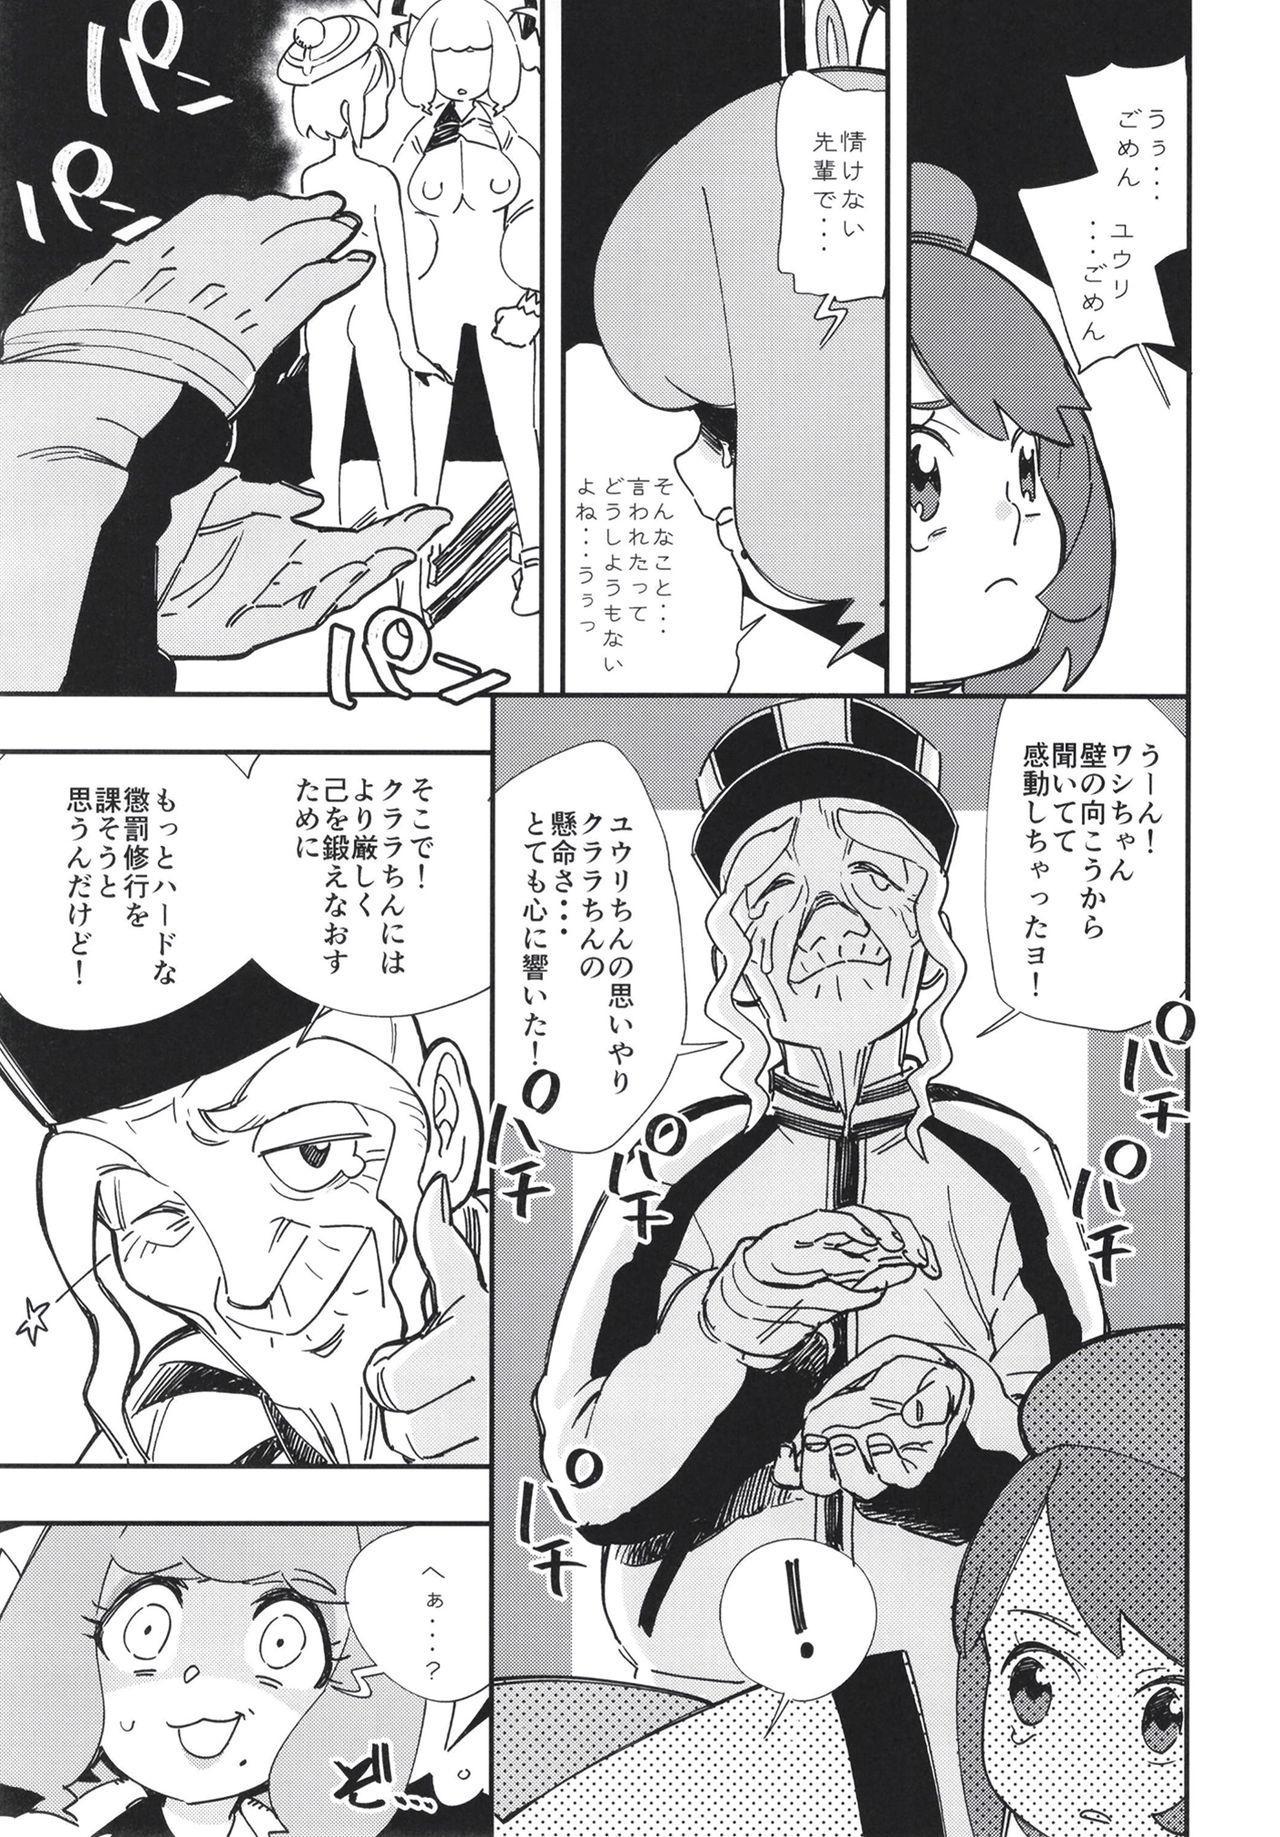 Kurakura Kyouka Gekkan 24